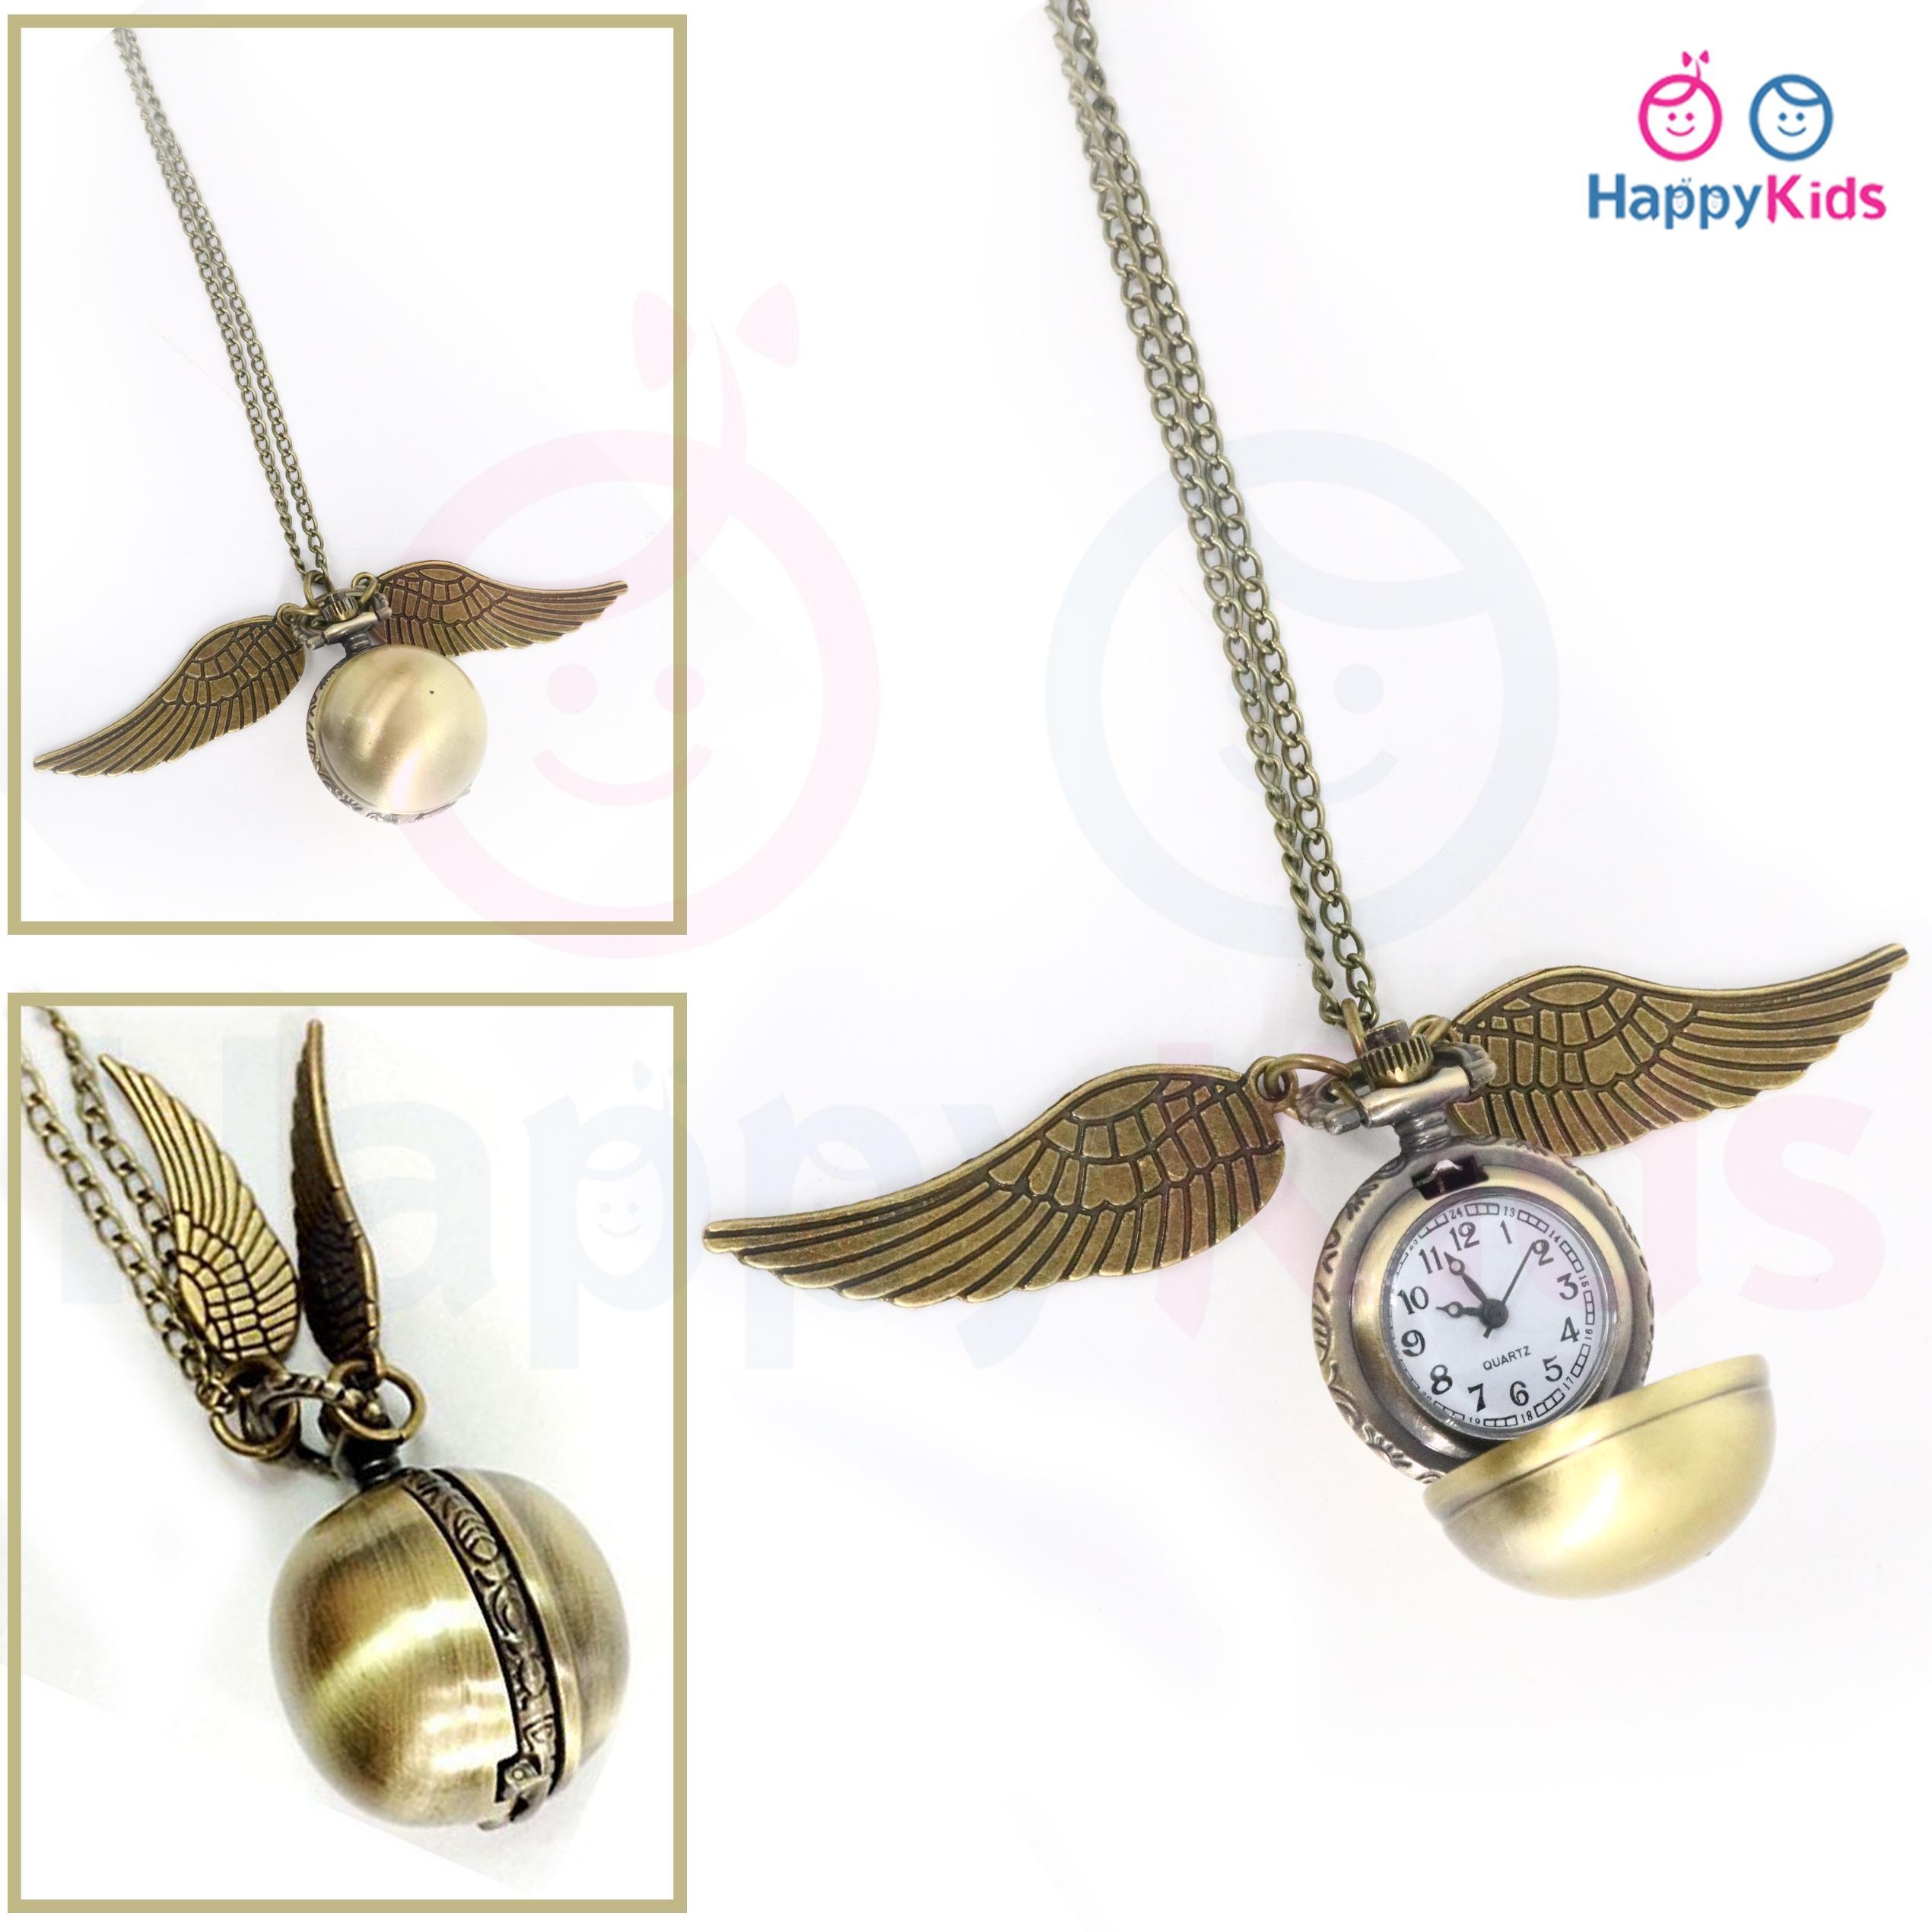 Harry Potter Snitch Watch Necklaces, Harry Potter Quartz Pocket Watches Men Women Gifts Harry Potter Necklace By Happy Kids.